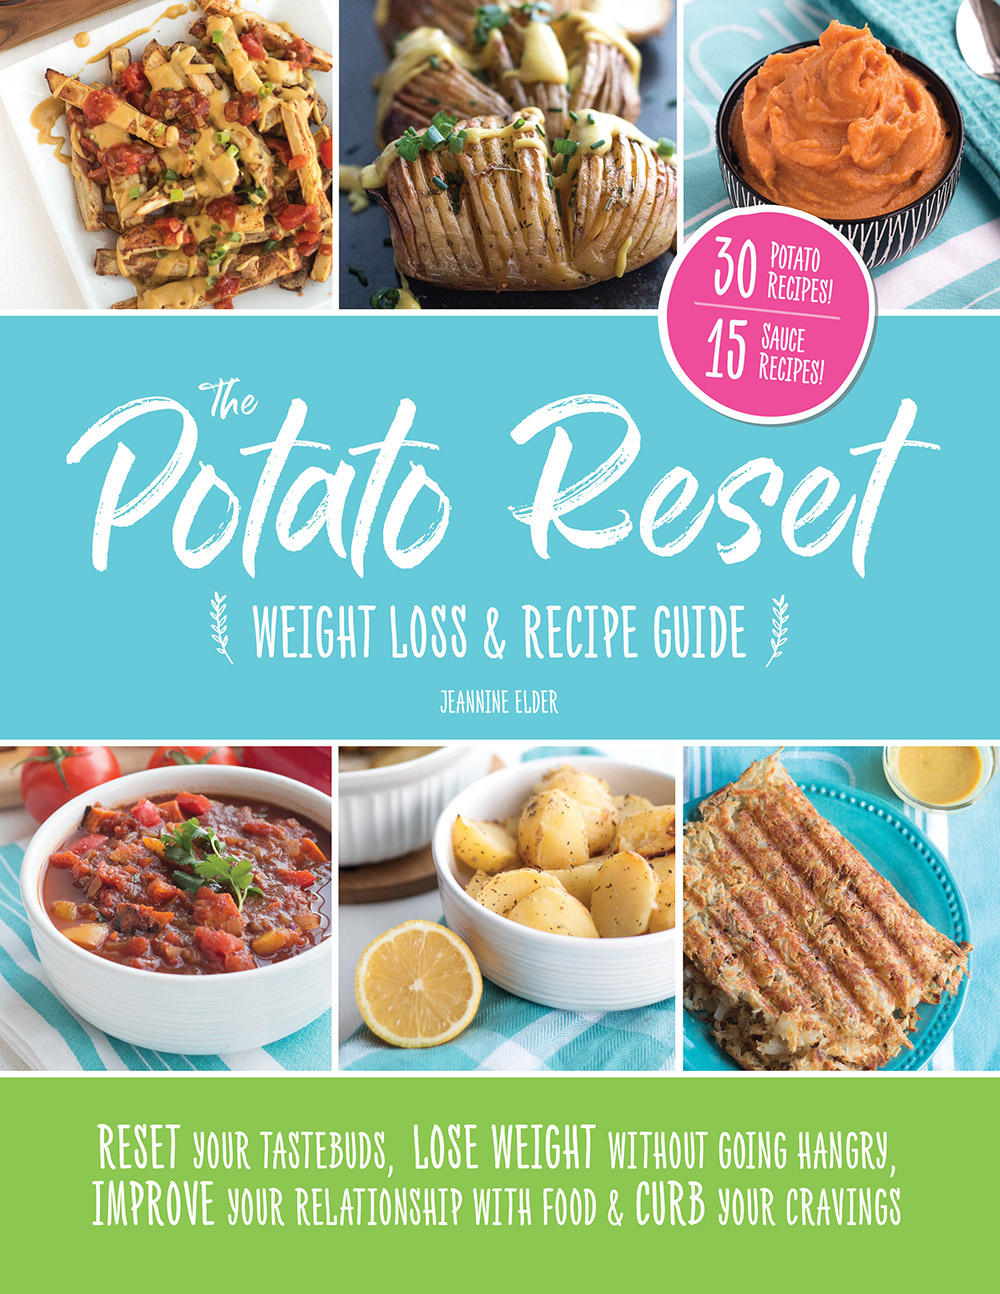 The Potato Reset